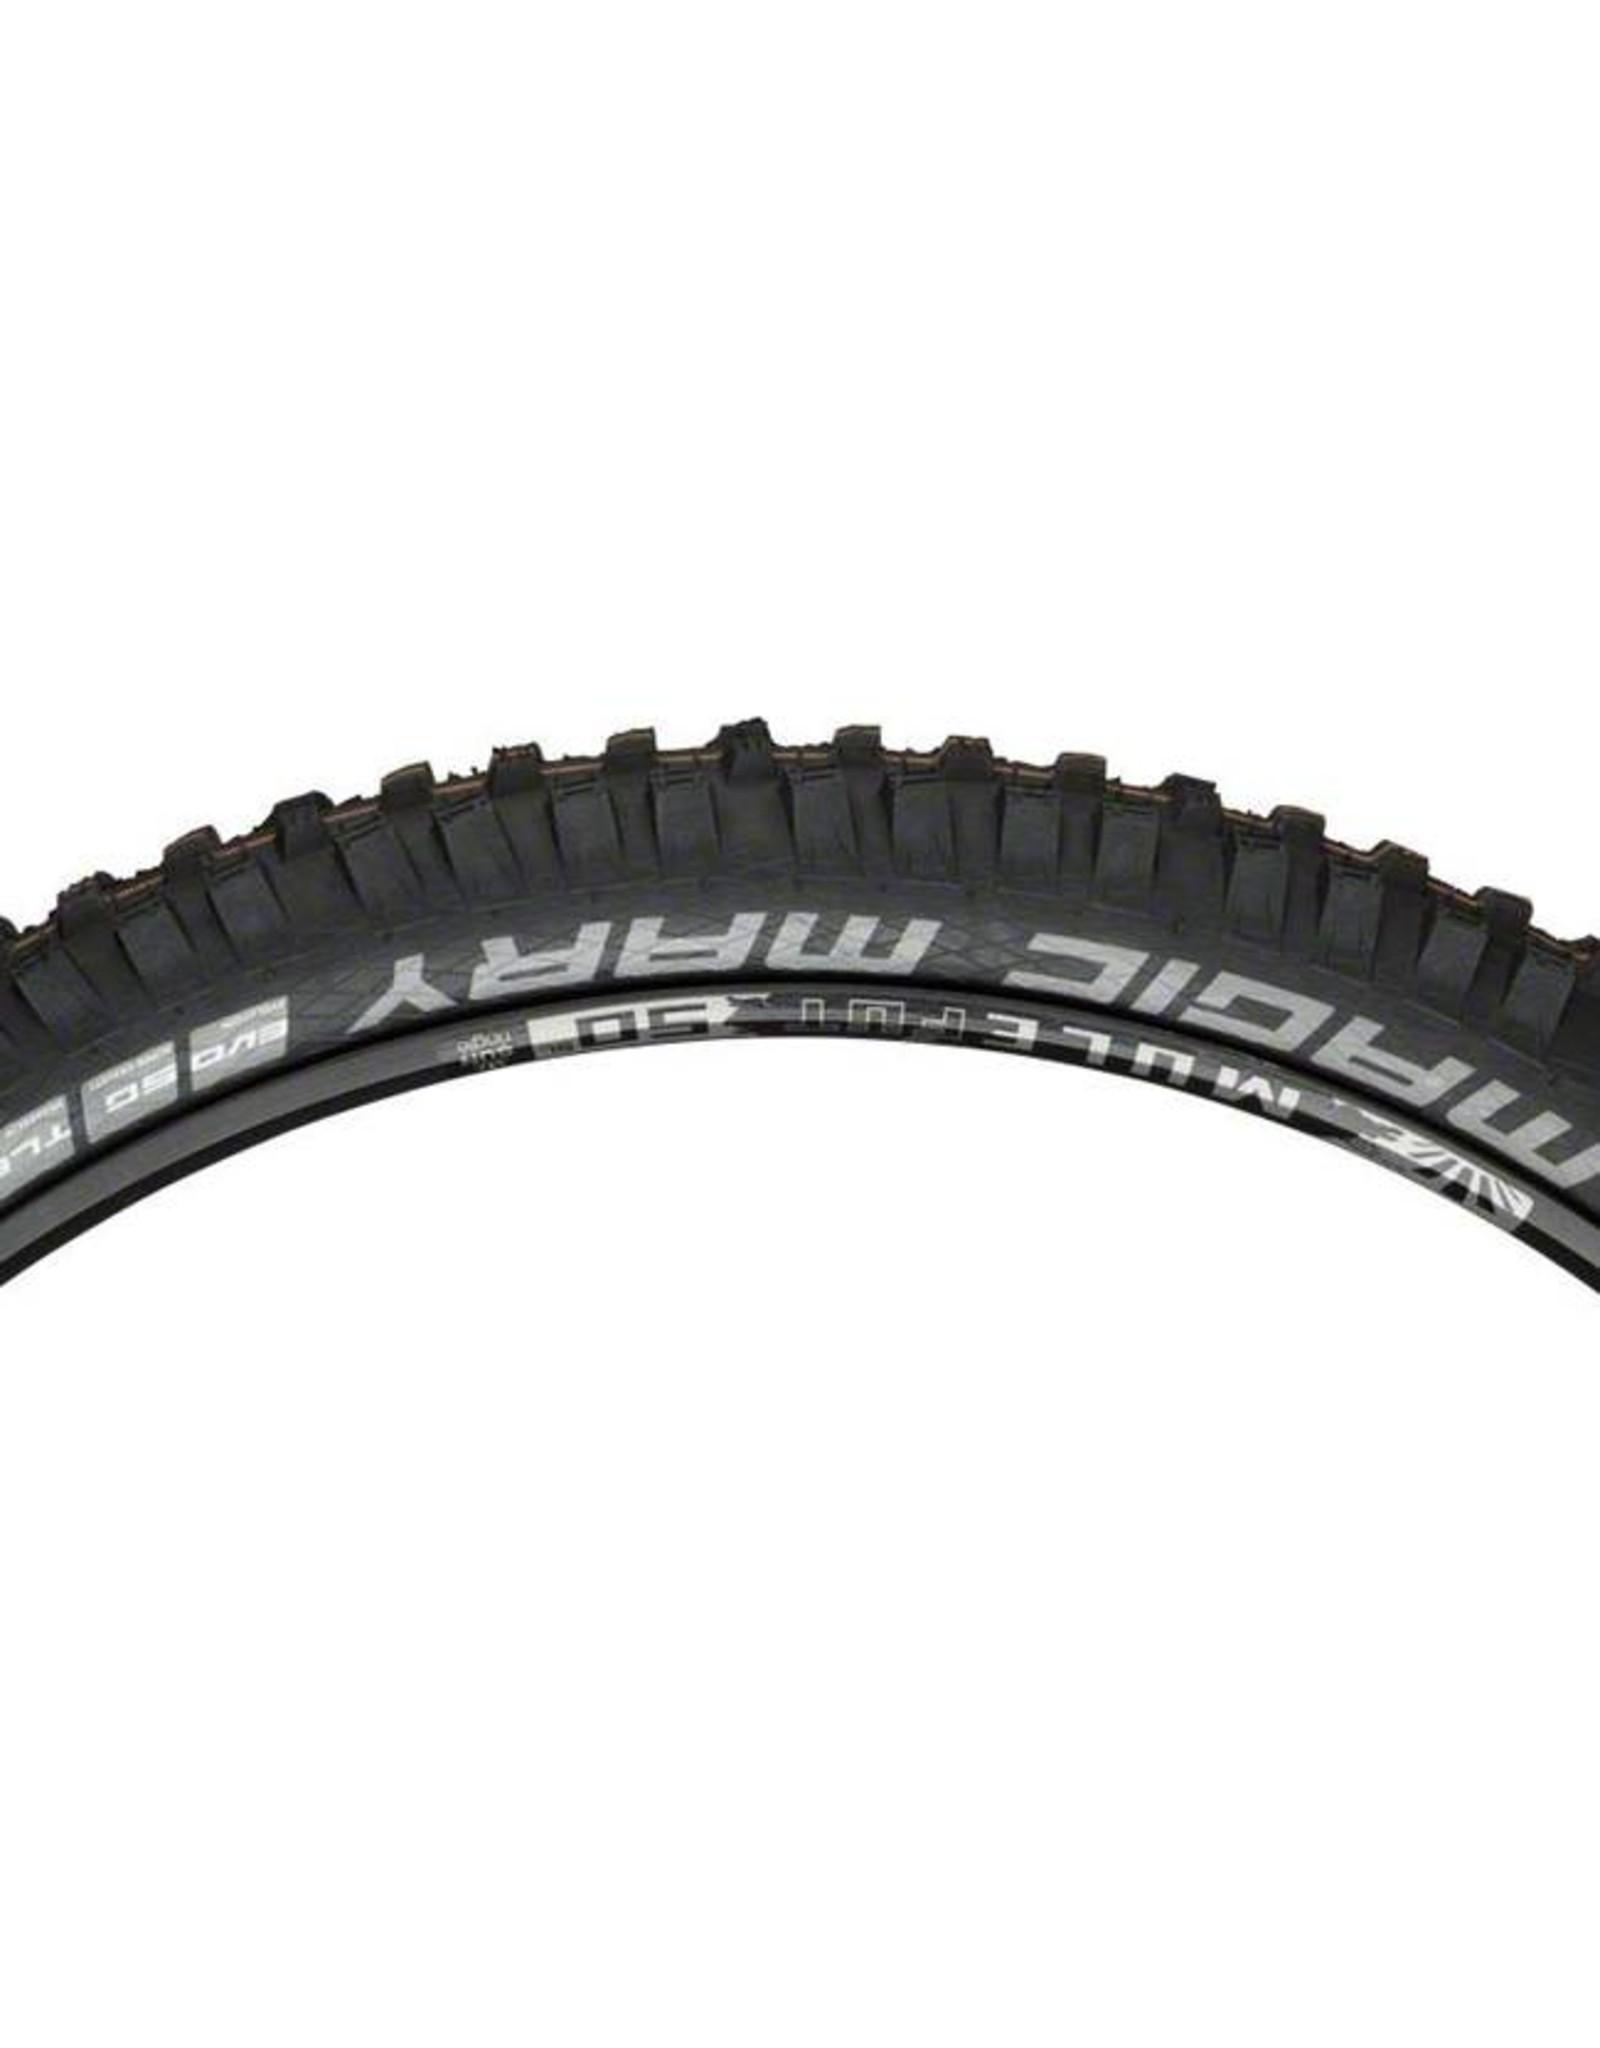 "Schwalbe Schwalbe Magic Mary Tire: 29 x 2.35"", Folding Bead, Evolution Line, Addix Soft Compound, Super Gravity, Tubeless Easy, Black"